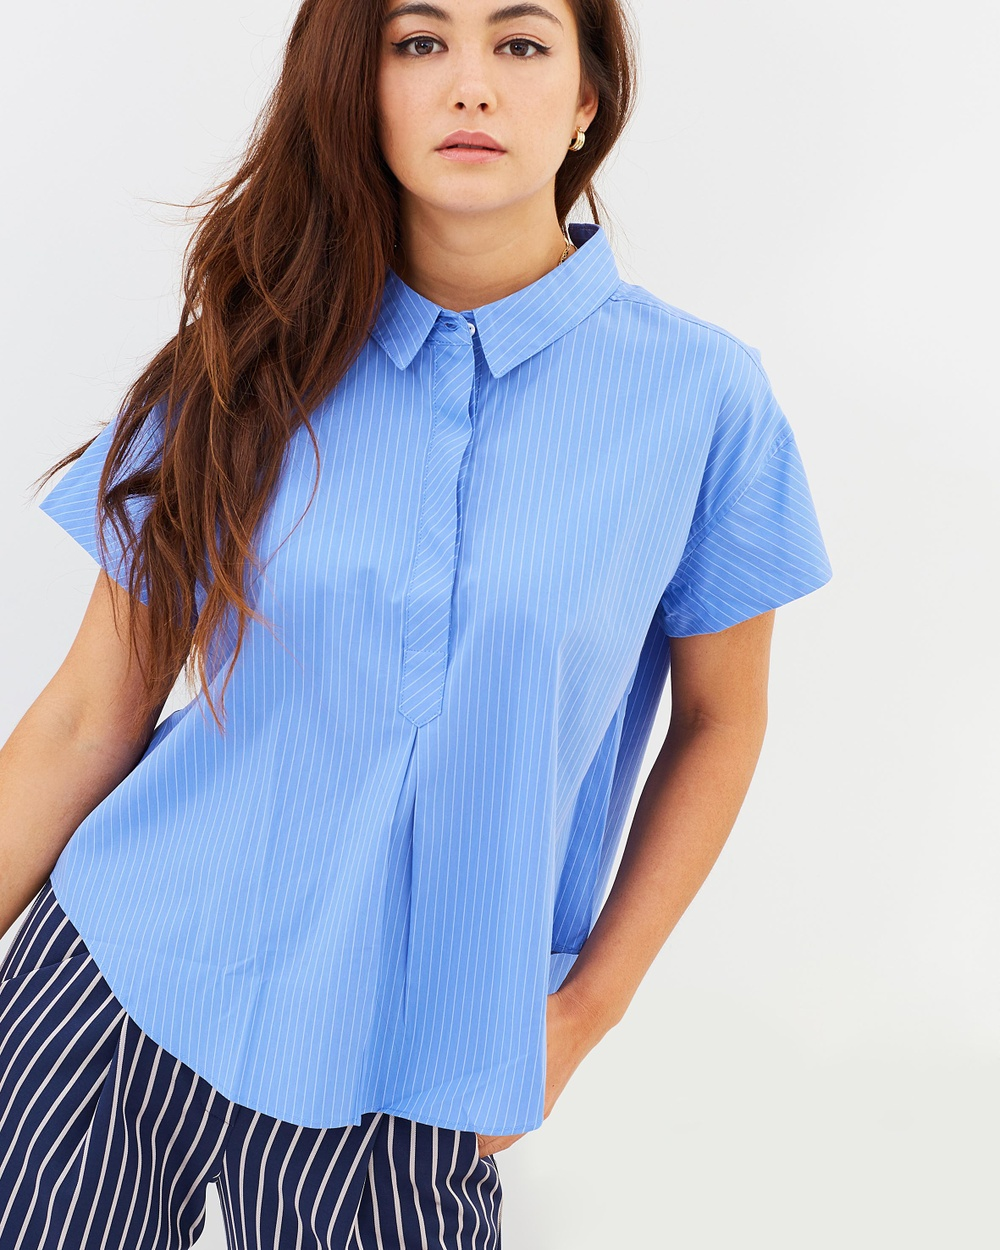 M.N.G Veranor Shirt Tops Celeste Veranor Shirt